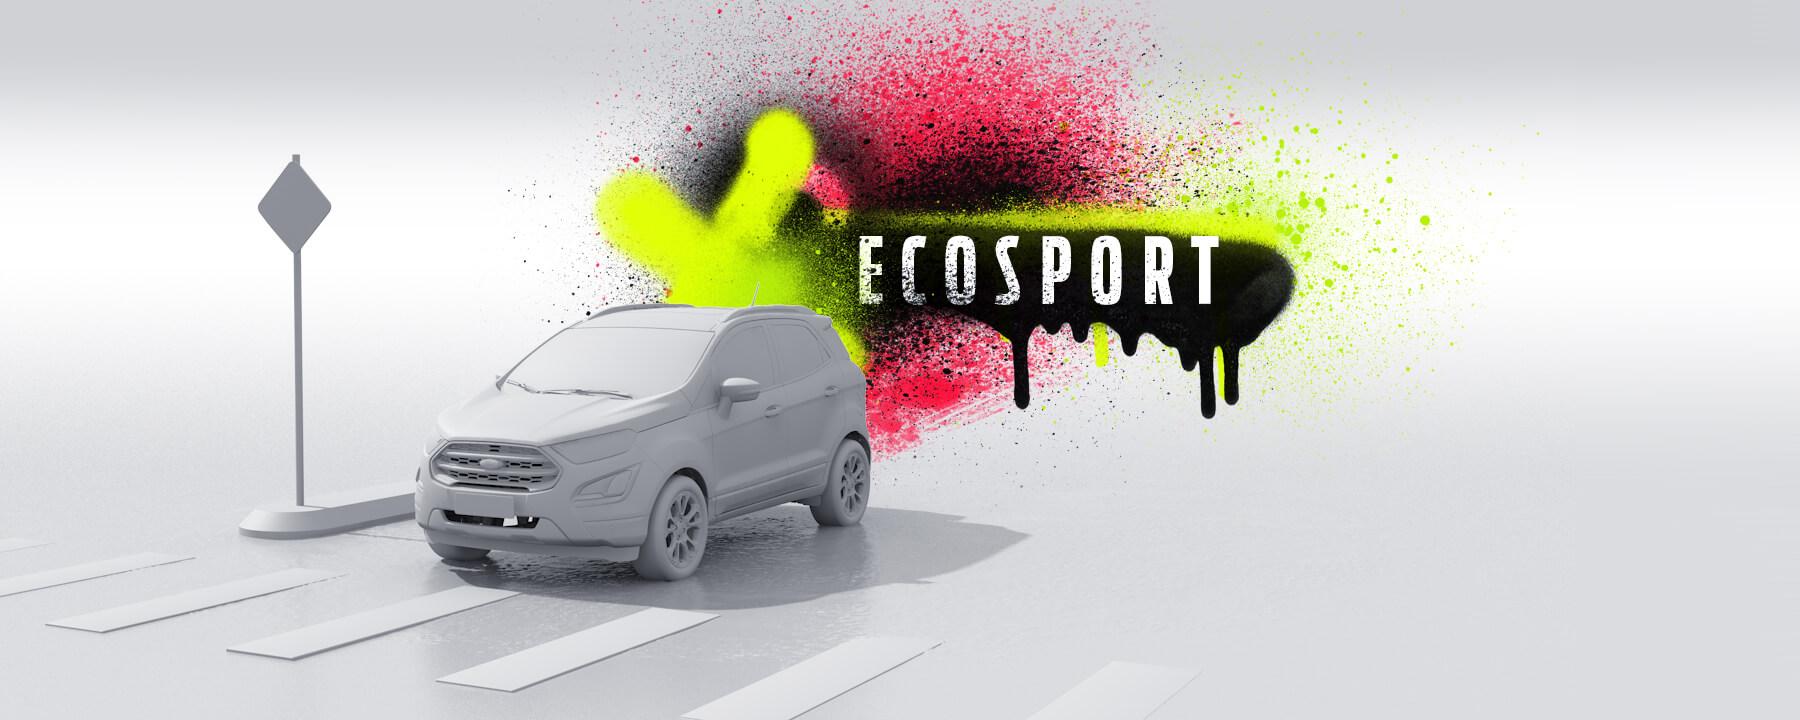 1_EcoSport